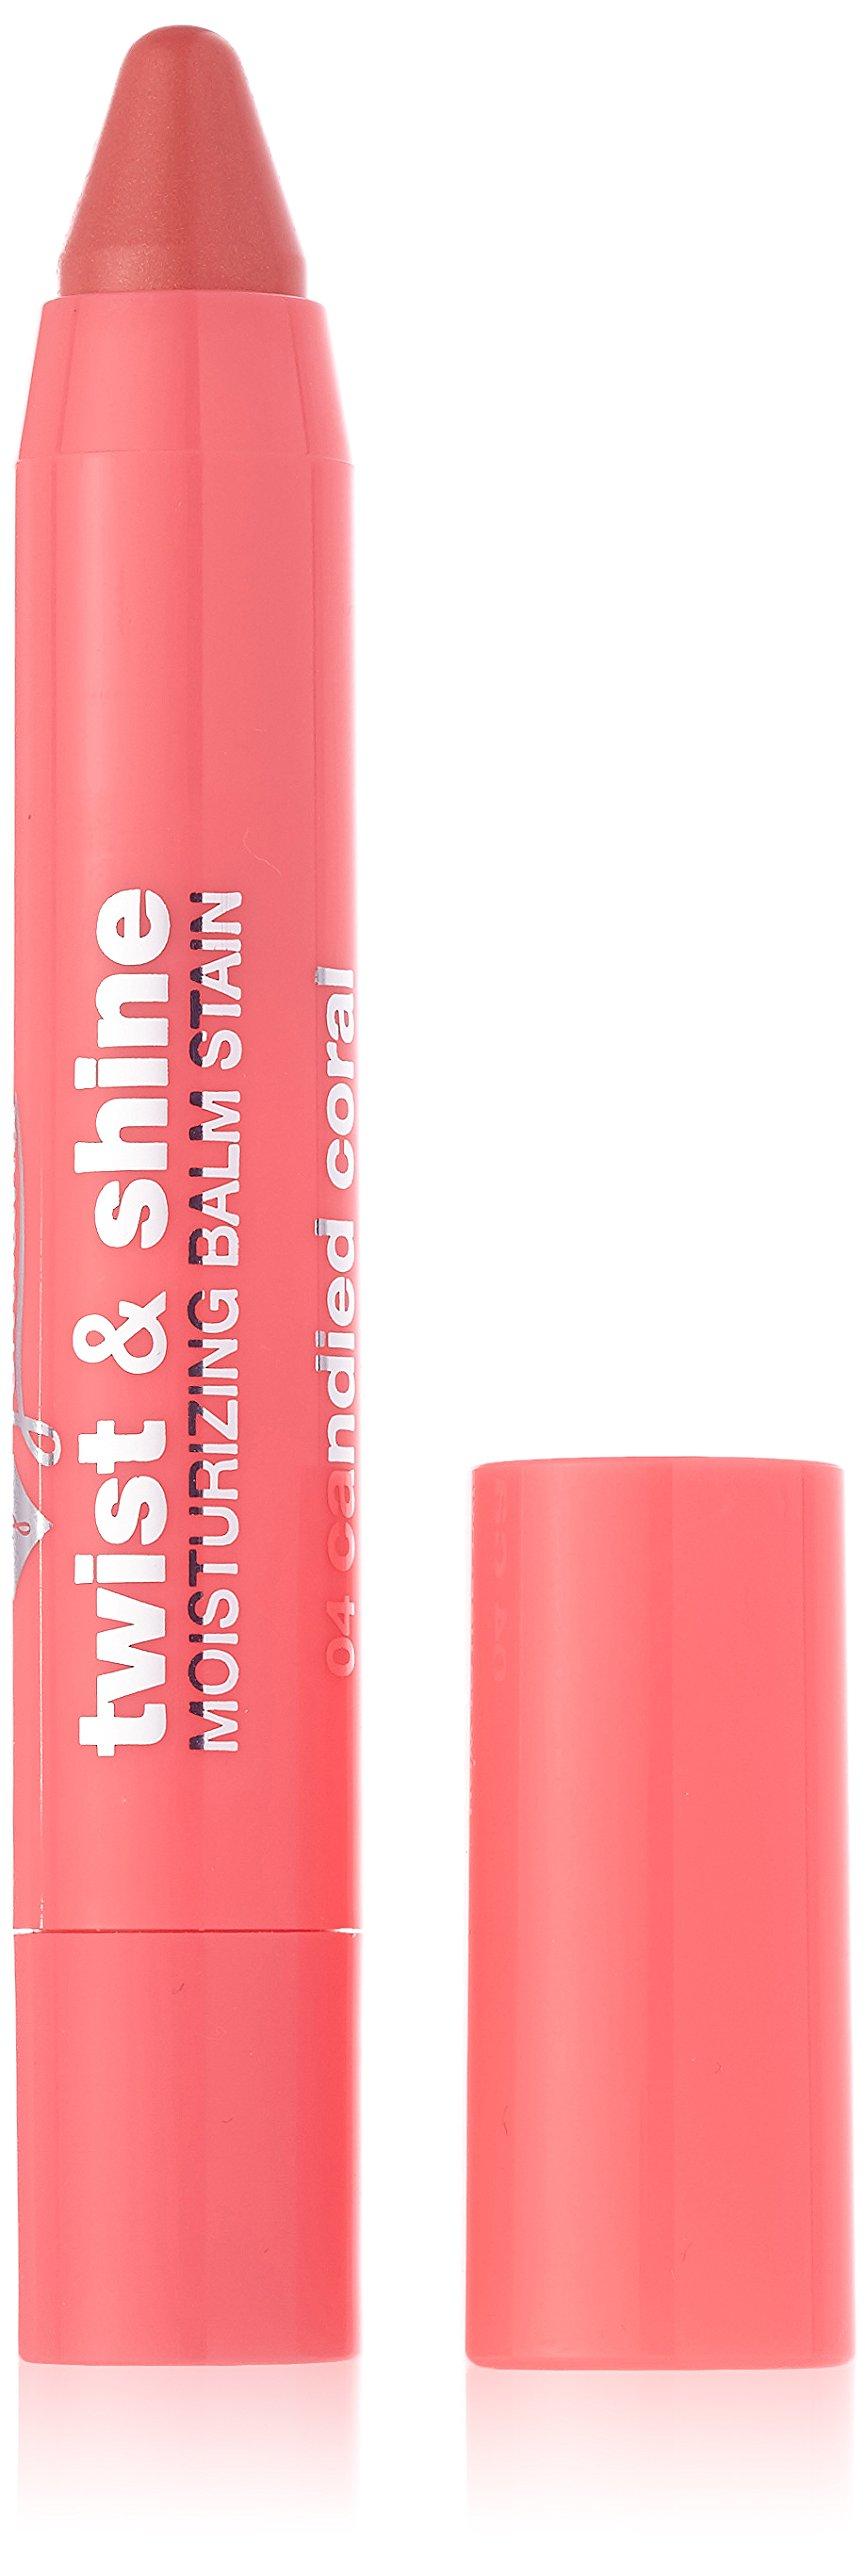 (3 Pack) JORDANA Twist & Shine Moisturizing Balm Stain - Rock N Rogue Clearasil Stubborn Acne Control 5in1 Concealing Treatment Cream, 1 oz